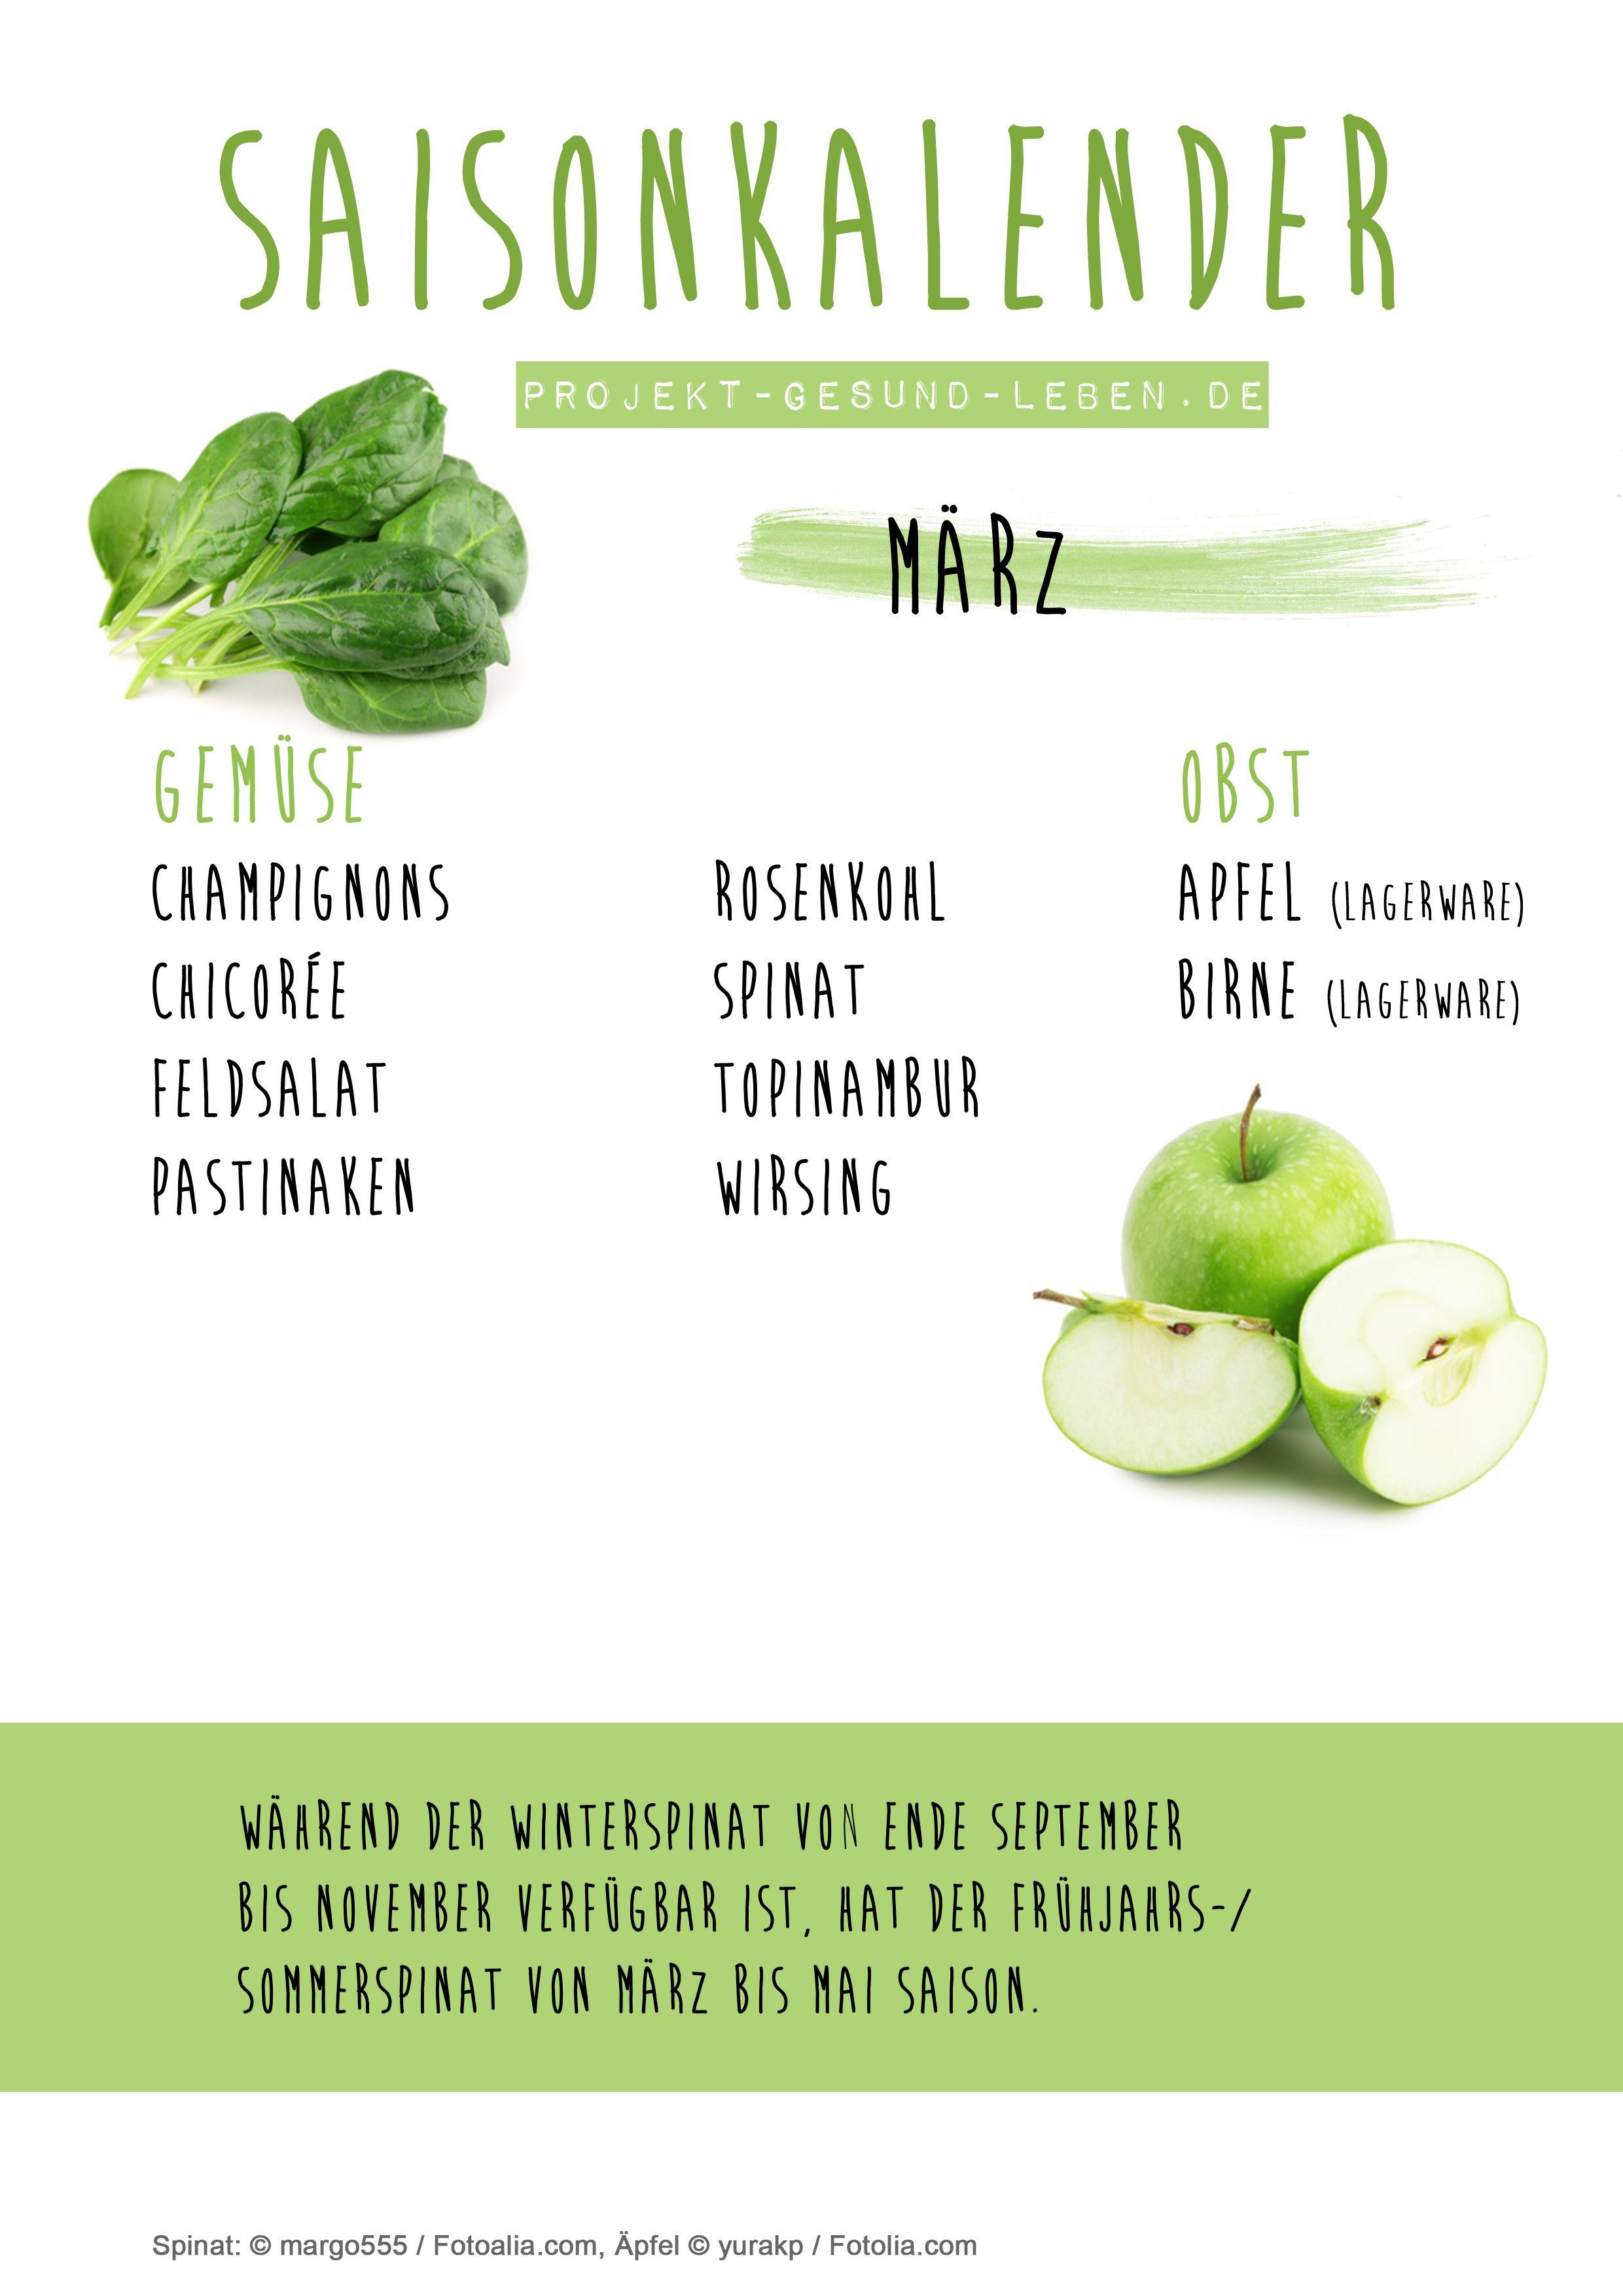 Saisonkalender März #cleaneating